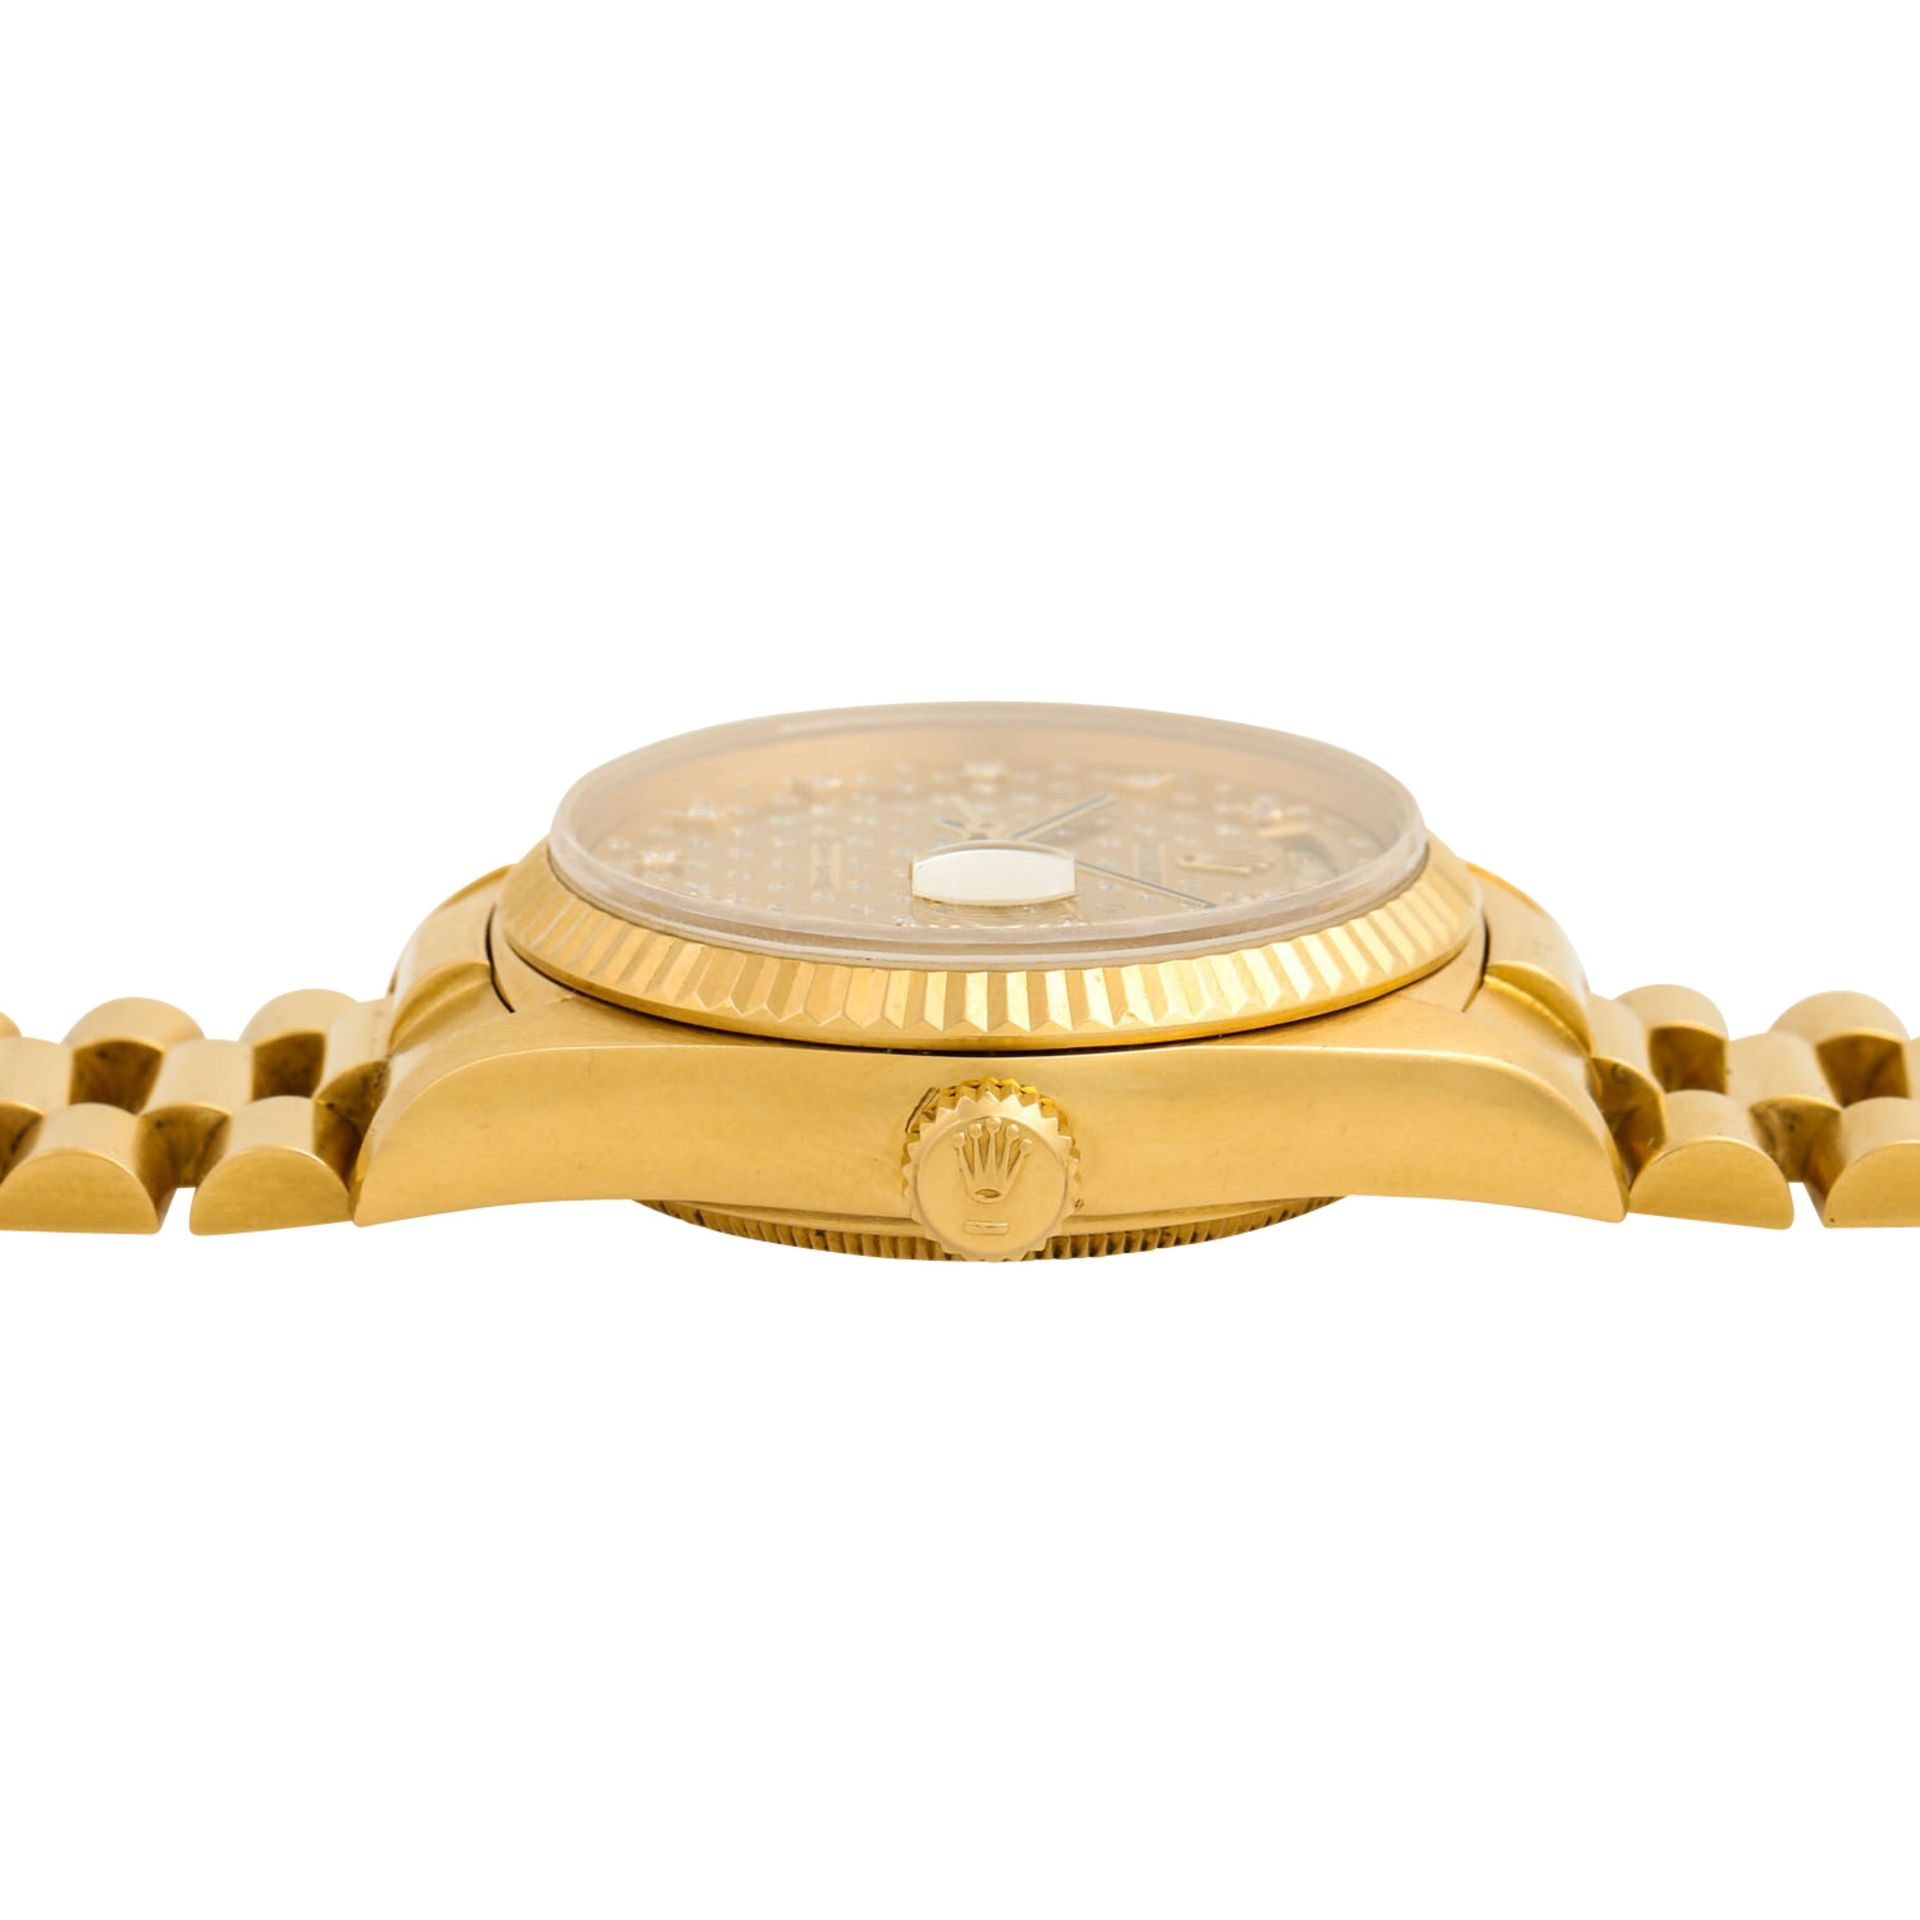 "ROLEX Vintage DayDate ""Sternenhimmel"", Ref. 18038. Armbanduhr. Gold 18K, Ziffernblatt - Image 3 of 8"